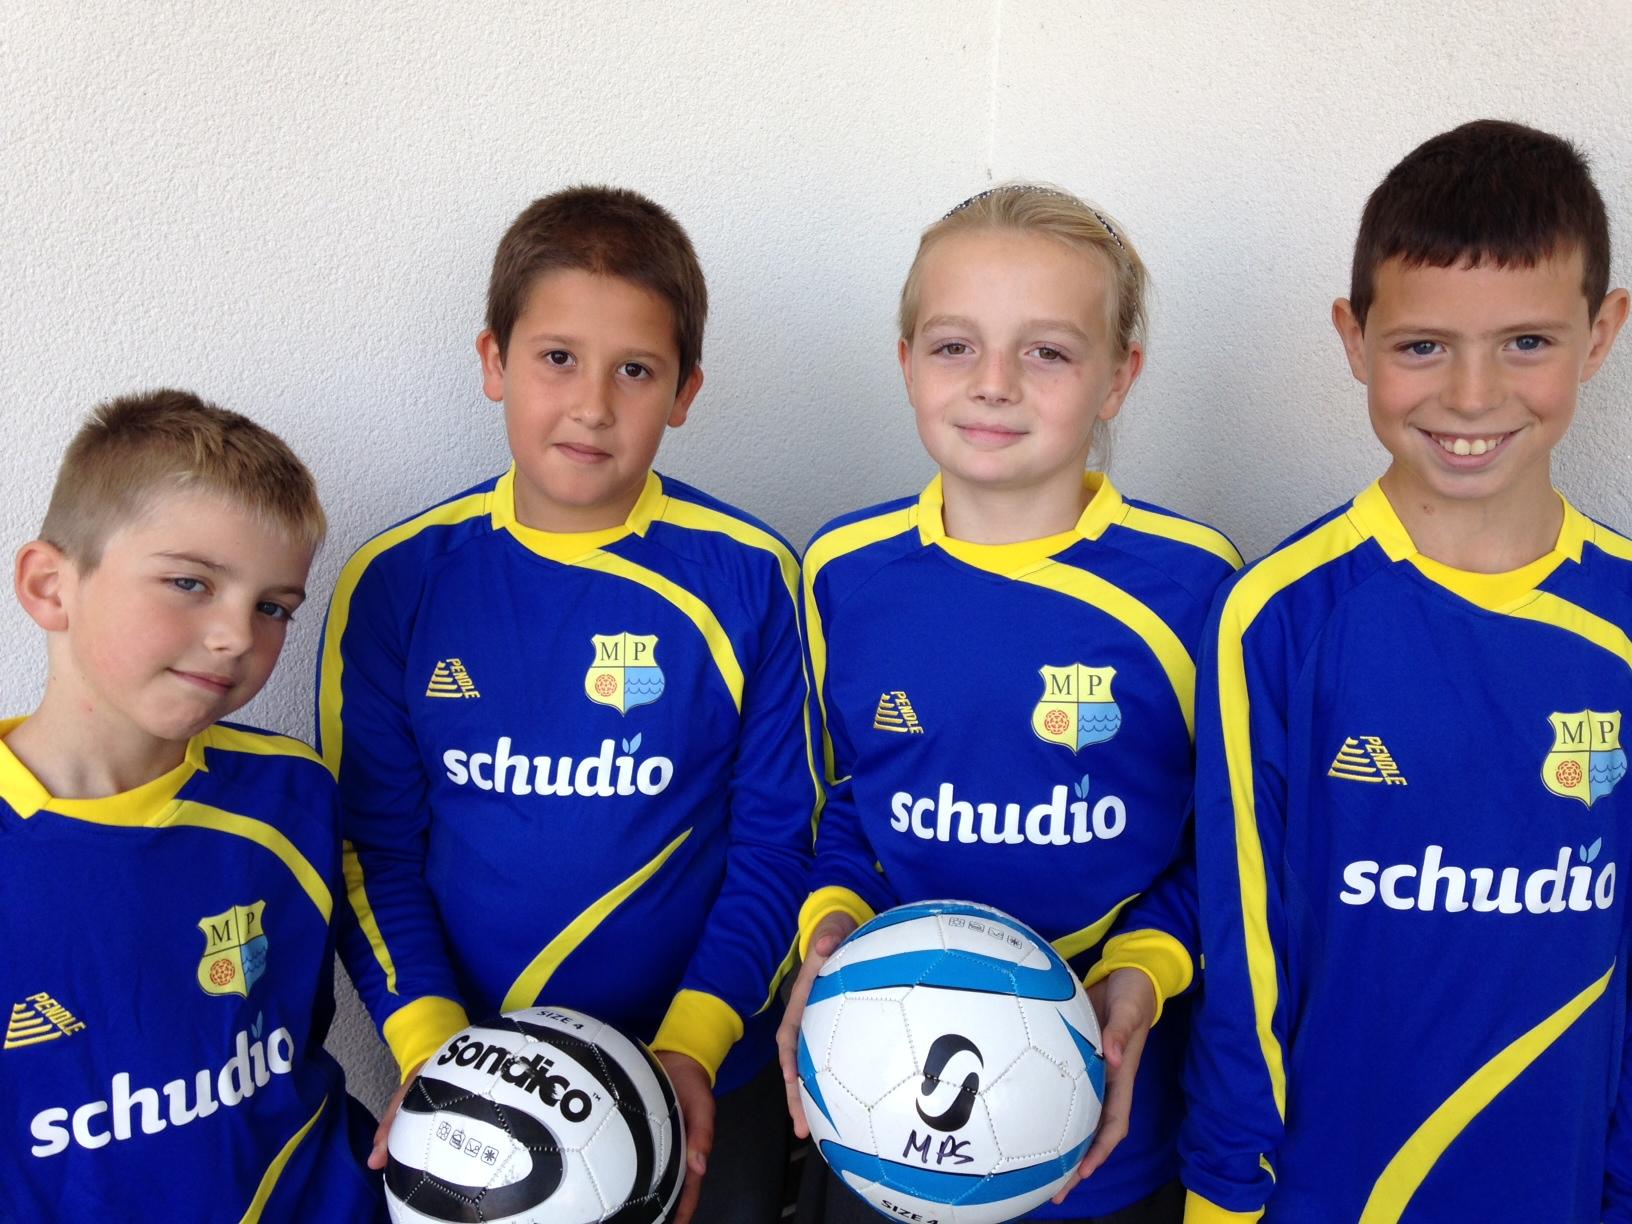 Mereside Football Team - Sponsored by Schudio